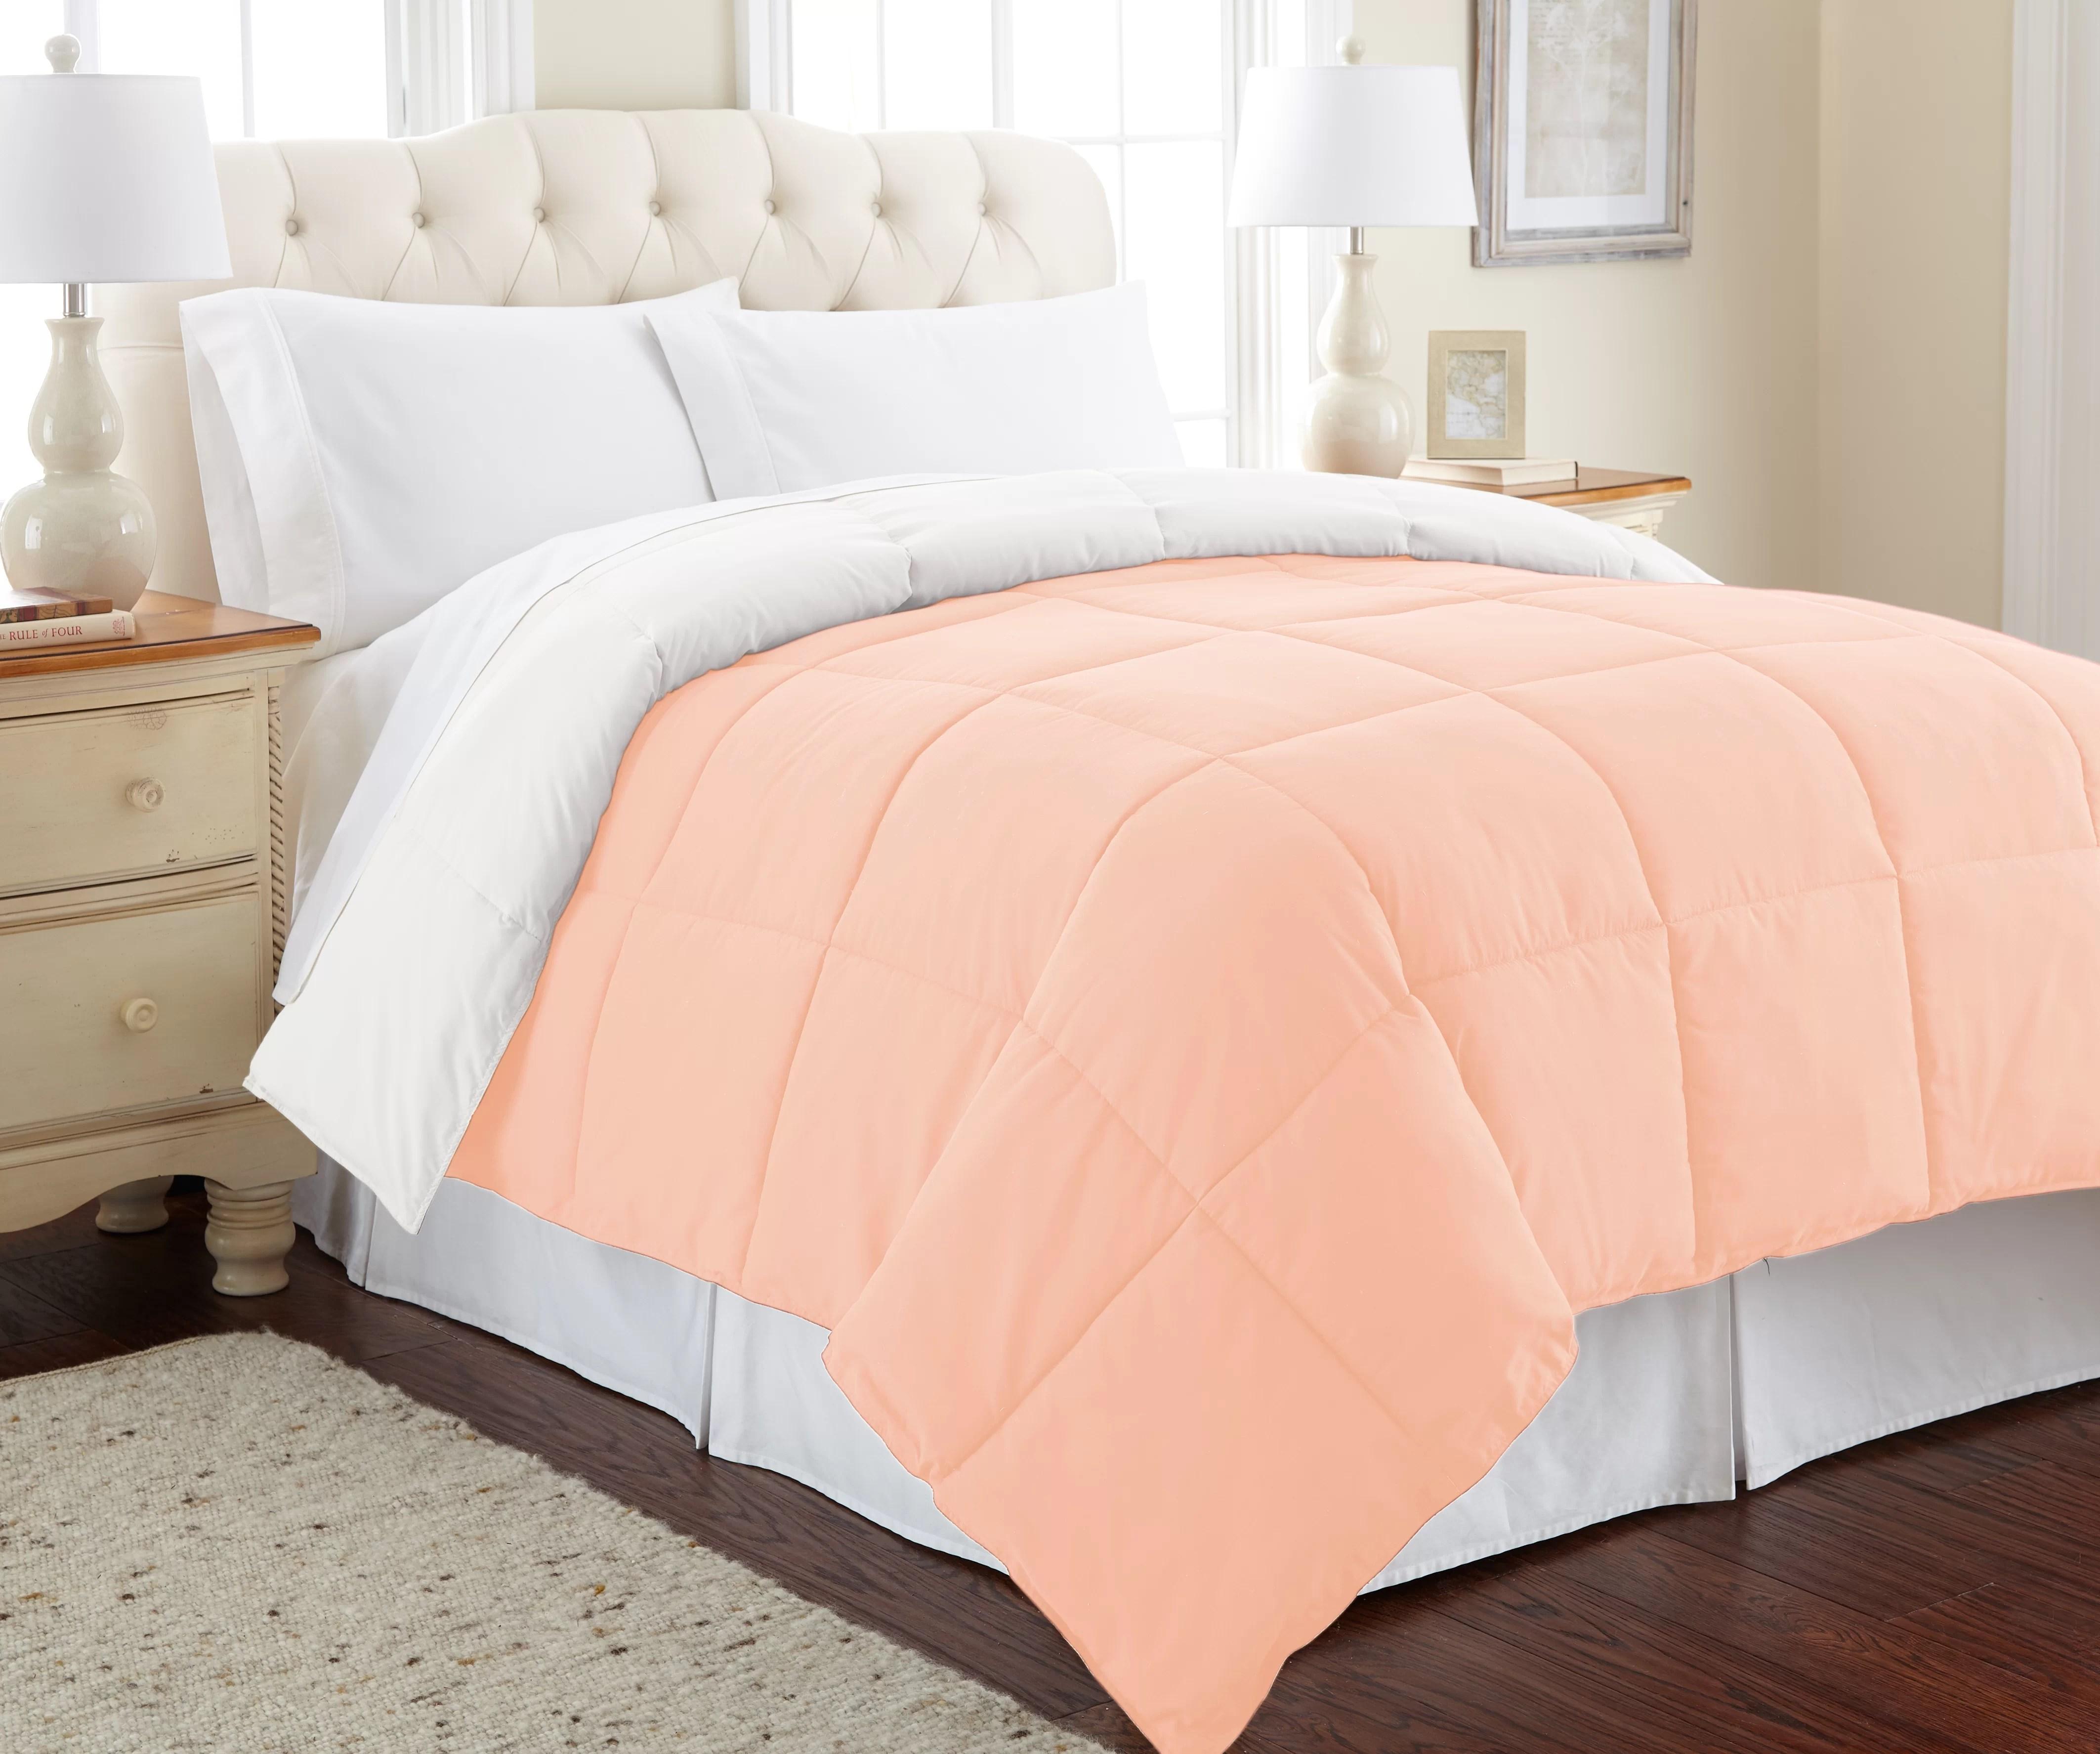 https www wayfair com bed bath sb2 king size white comforters sets c215334 a9645 33036 a9648 33076 html